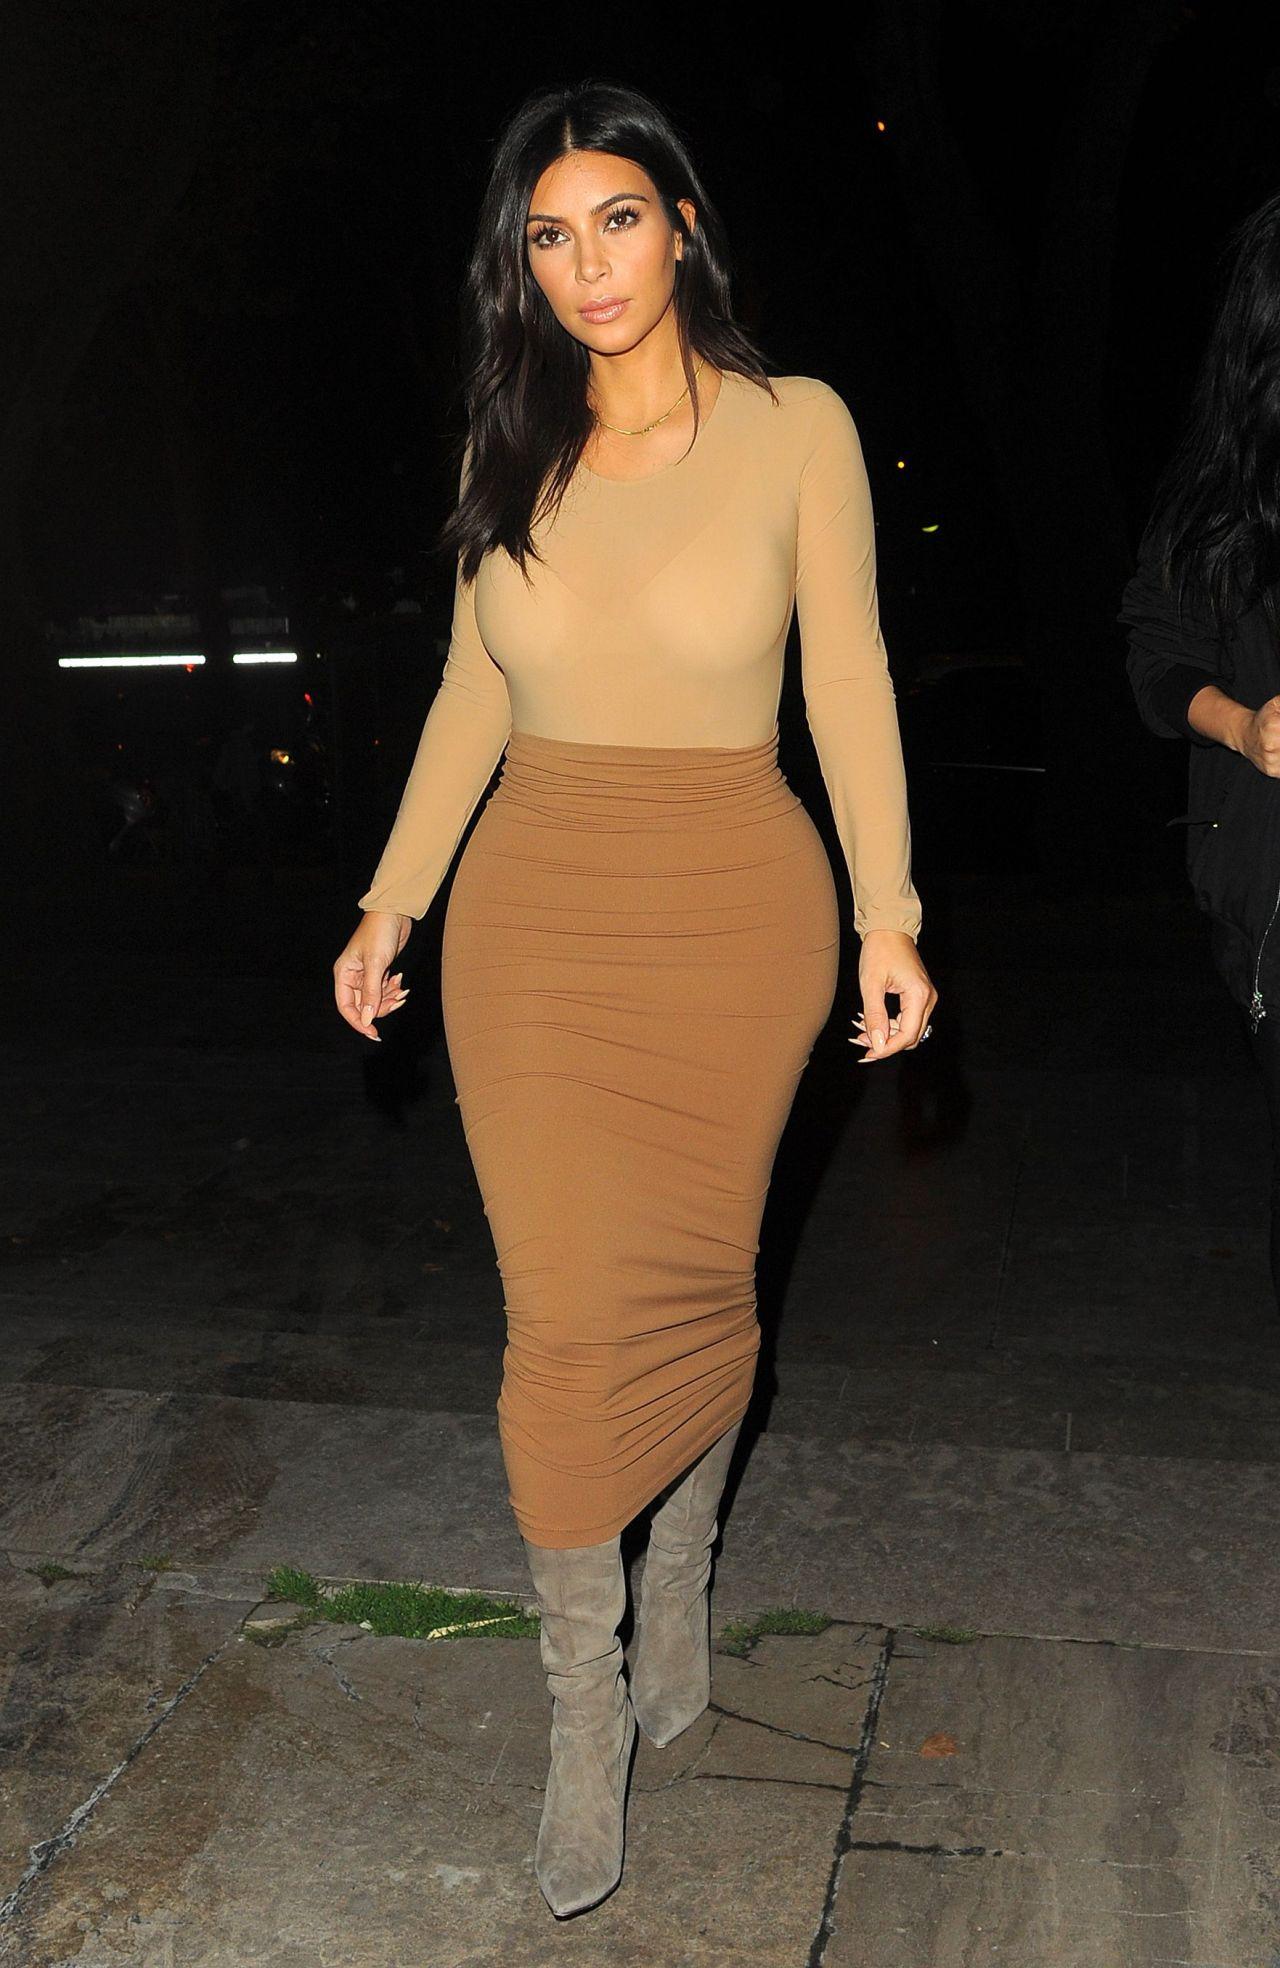 Kim Kardashian - Arriving at the Bunim Murray Production